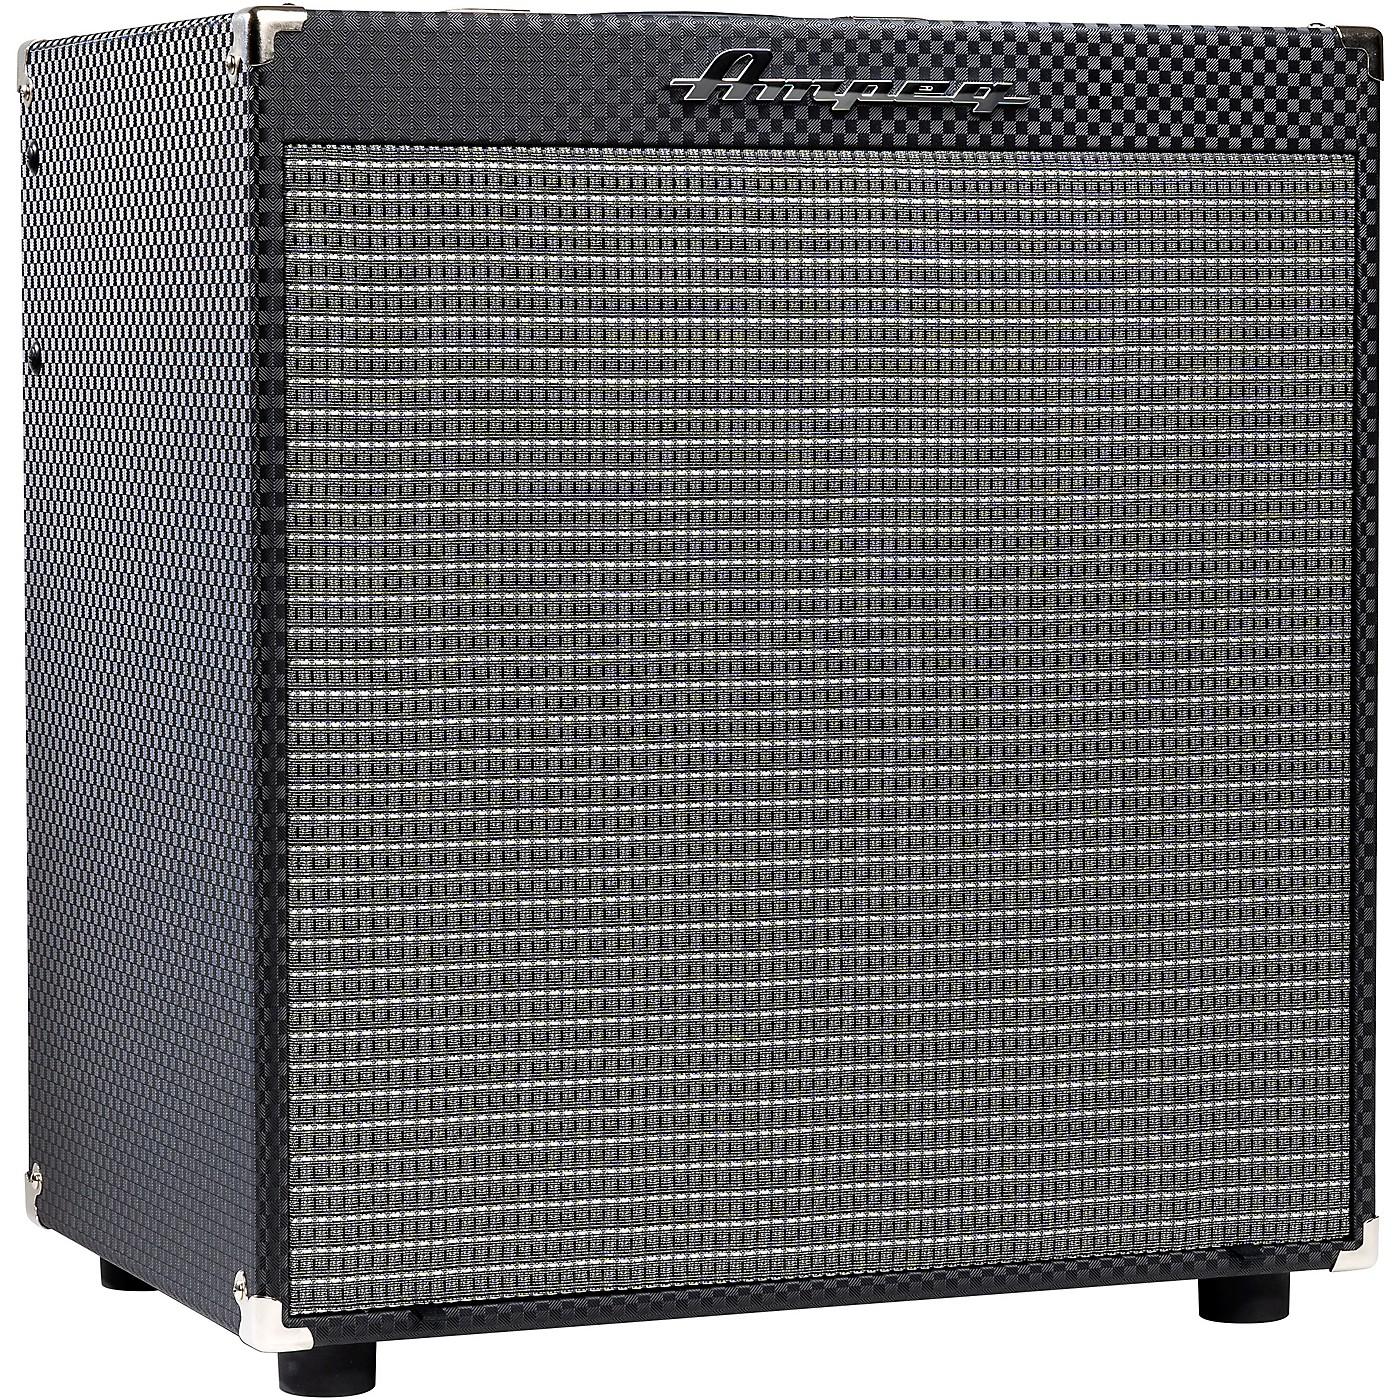 Ampeg Rocket Bass RB-115 1x15 200W Bass Combo Amp thumbnail